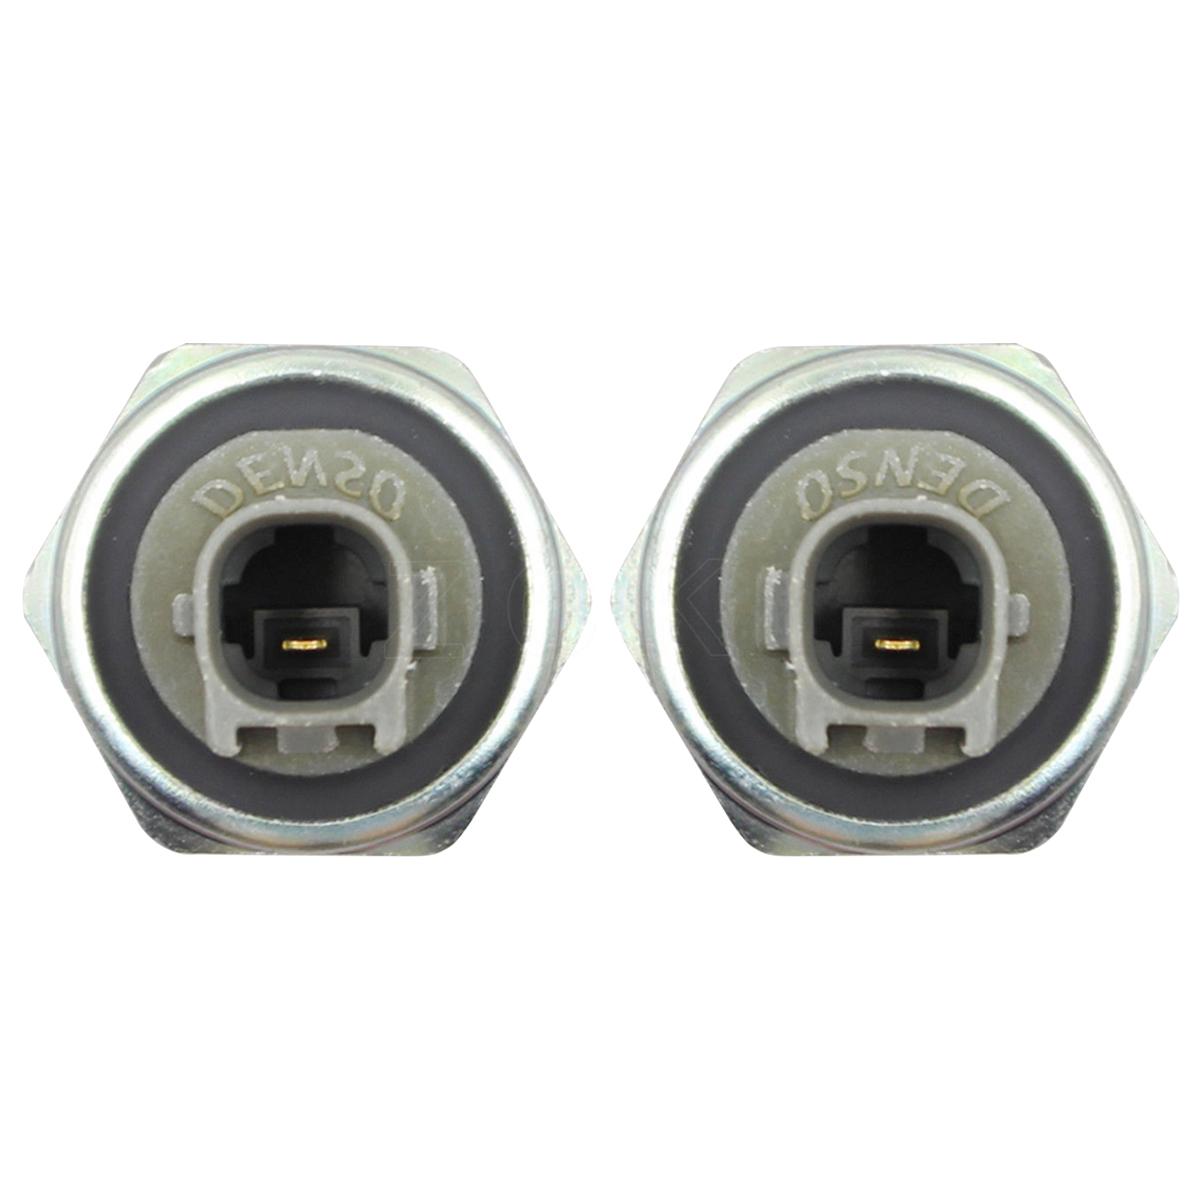 2pcs Oem Knock Sensors W Harness 89615 12050 For Lexus Rx300 Toyota Sensor Wiring Diagram 2x Denso Highlander